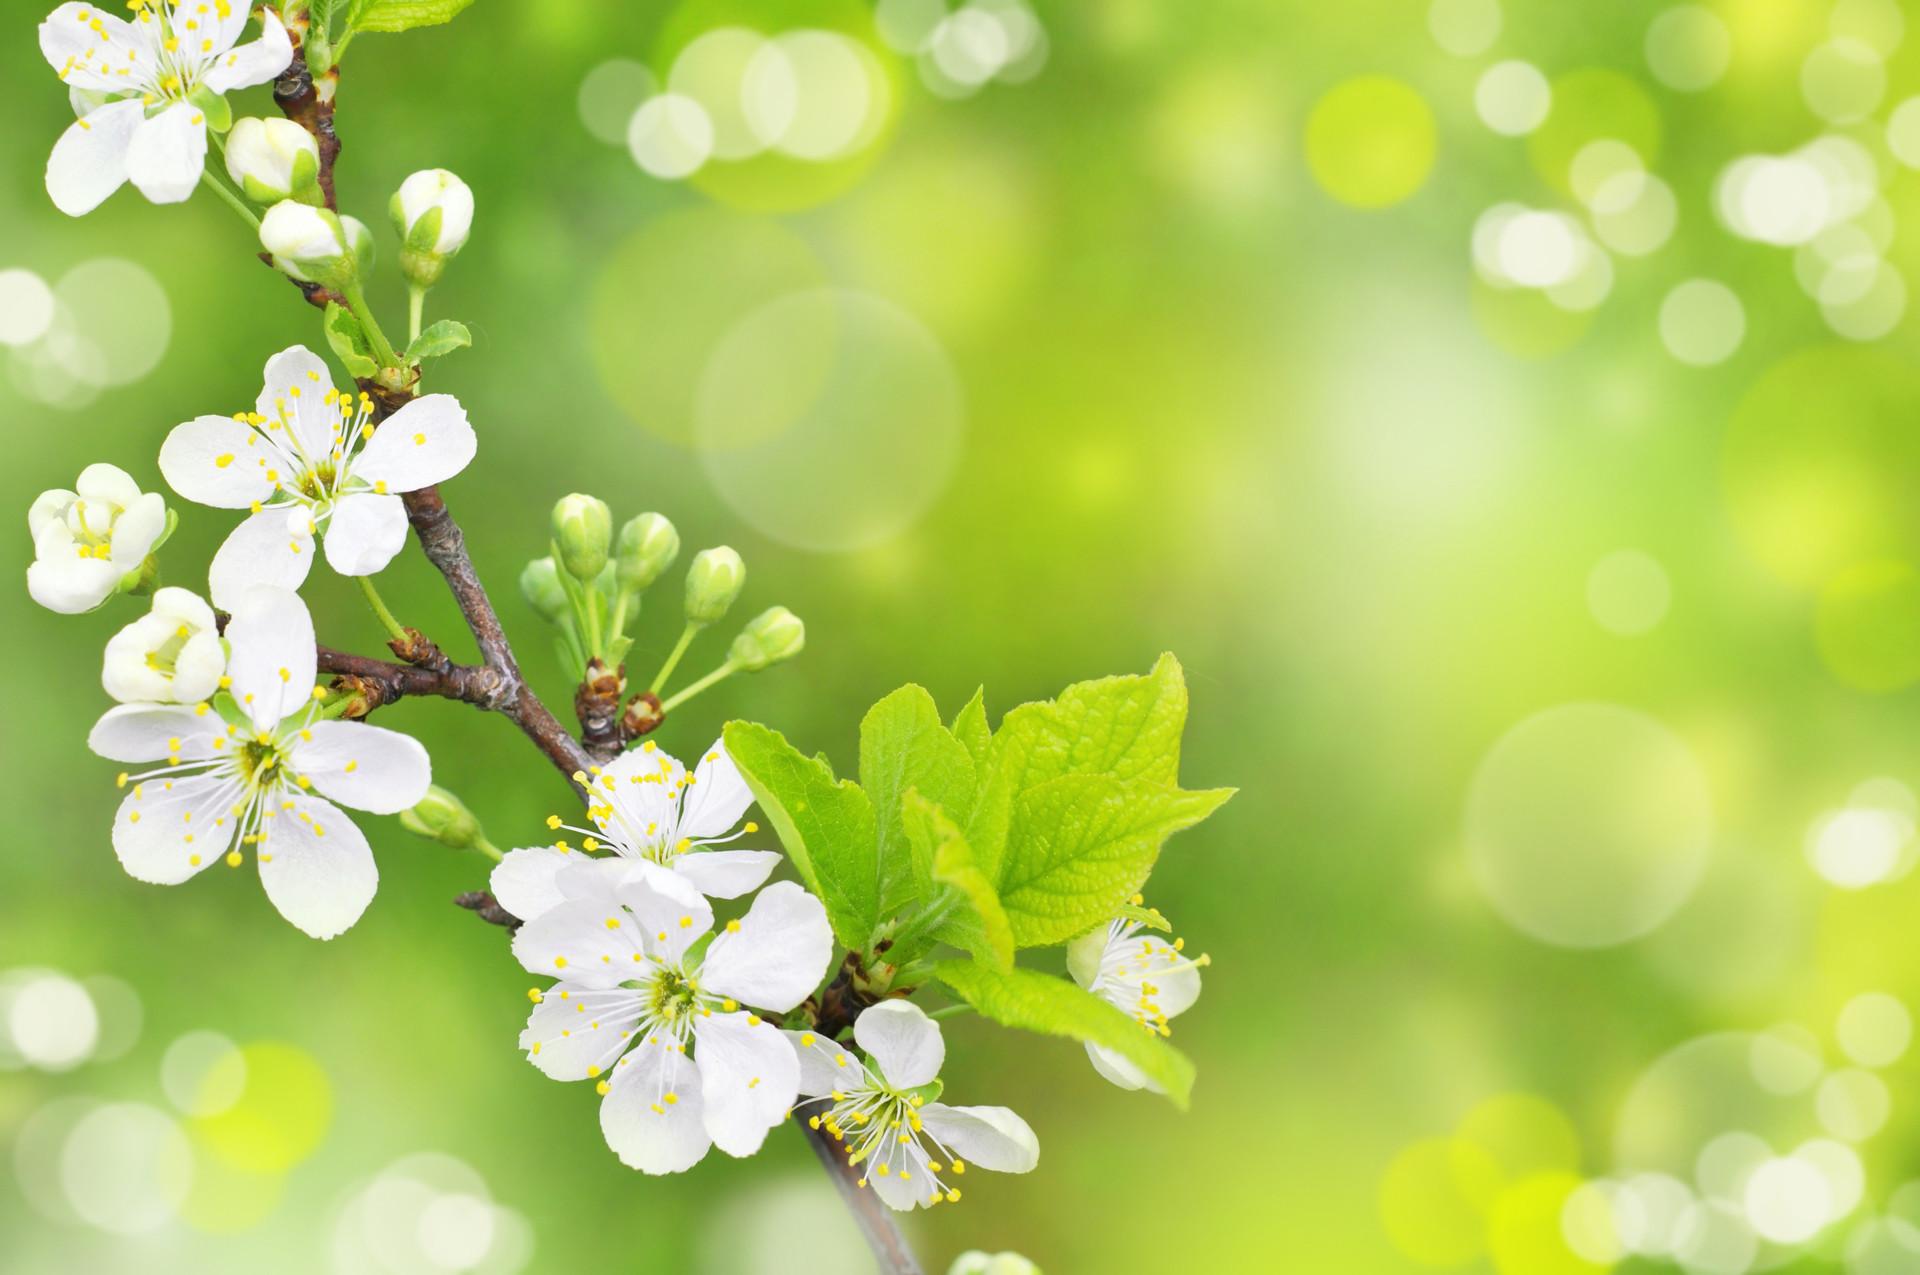 Spring 16, Free Wallpapers, Free Desktop Wallpapers, HD Wallpapers